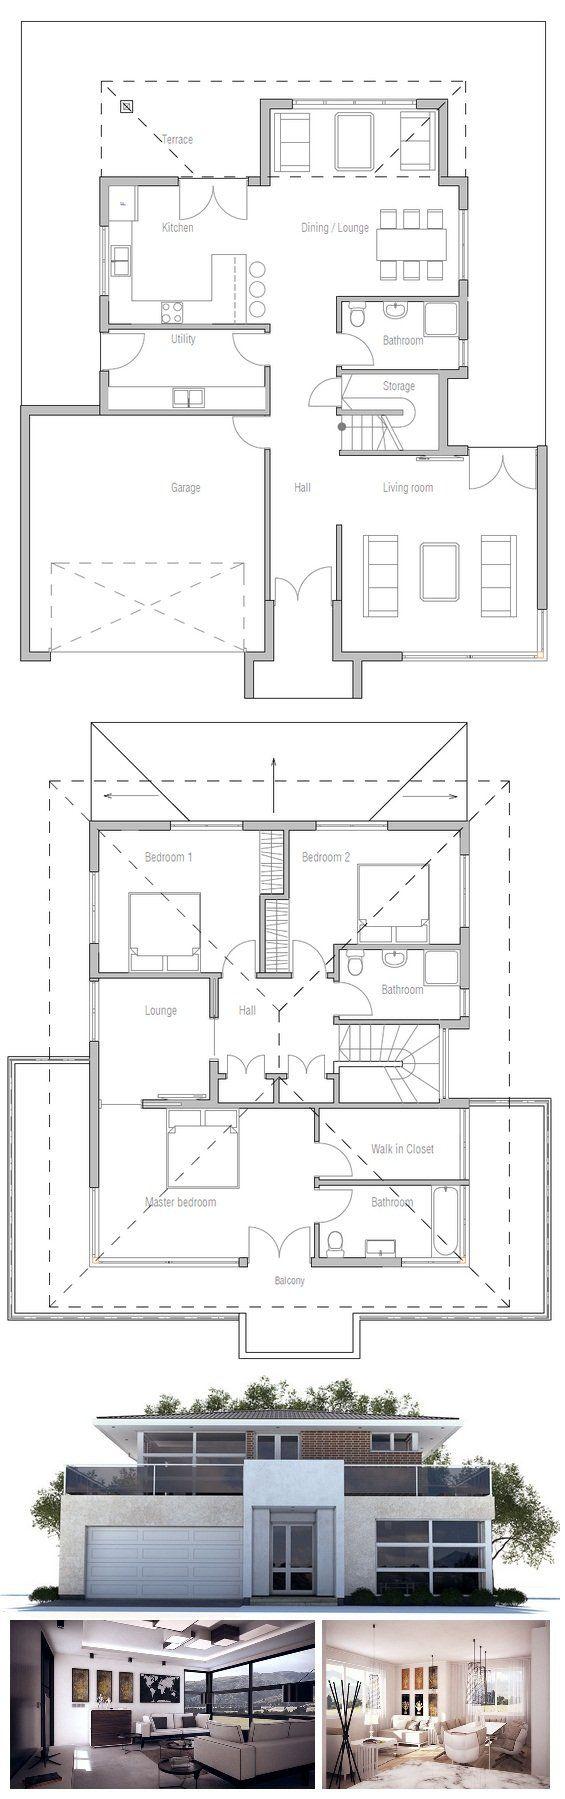 Concepthome Com Bedrooms Floor Three Bedrooms Master Bedrooms Hall